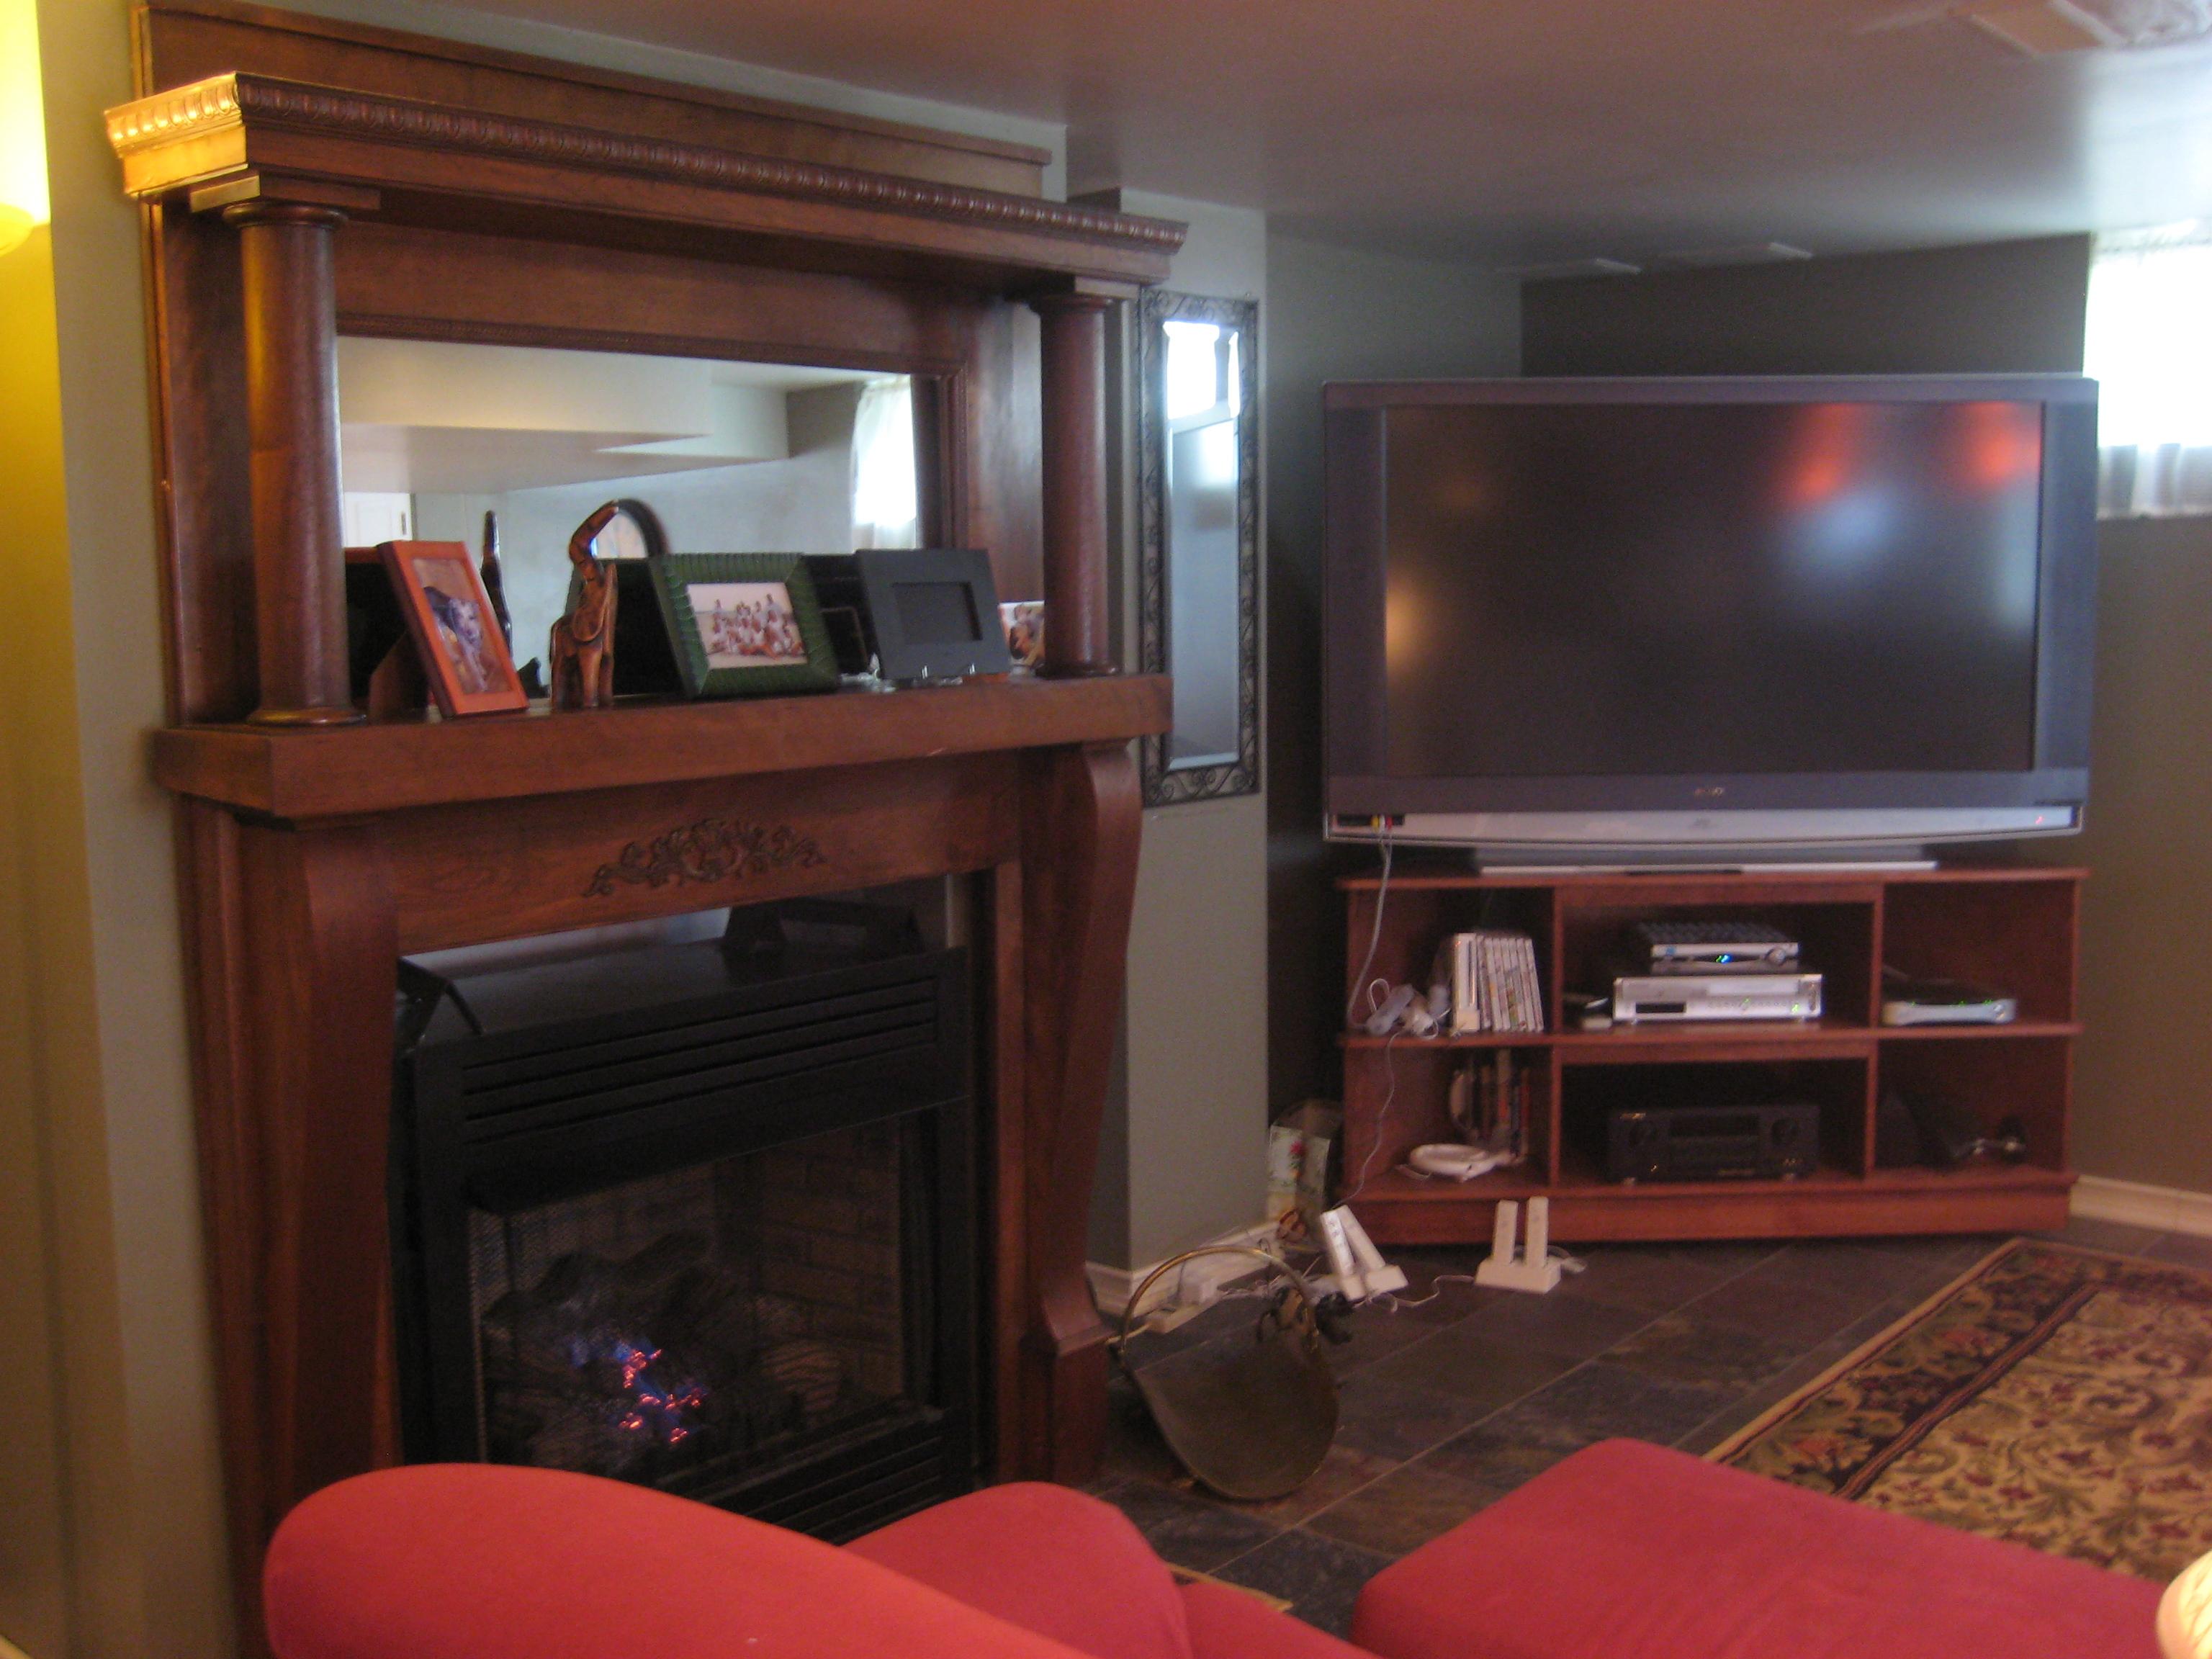 mother in law suite garage renovation ideas - Basment Remodeling Ideas Den